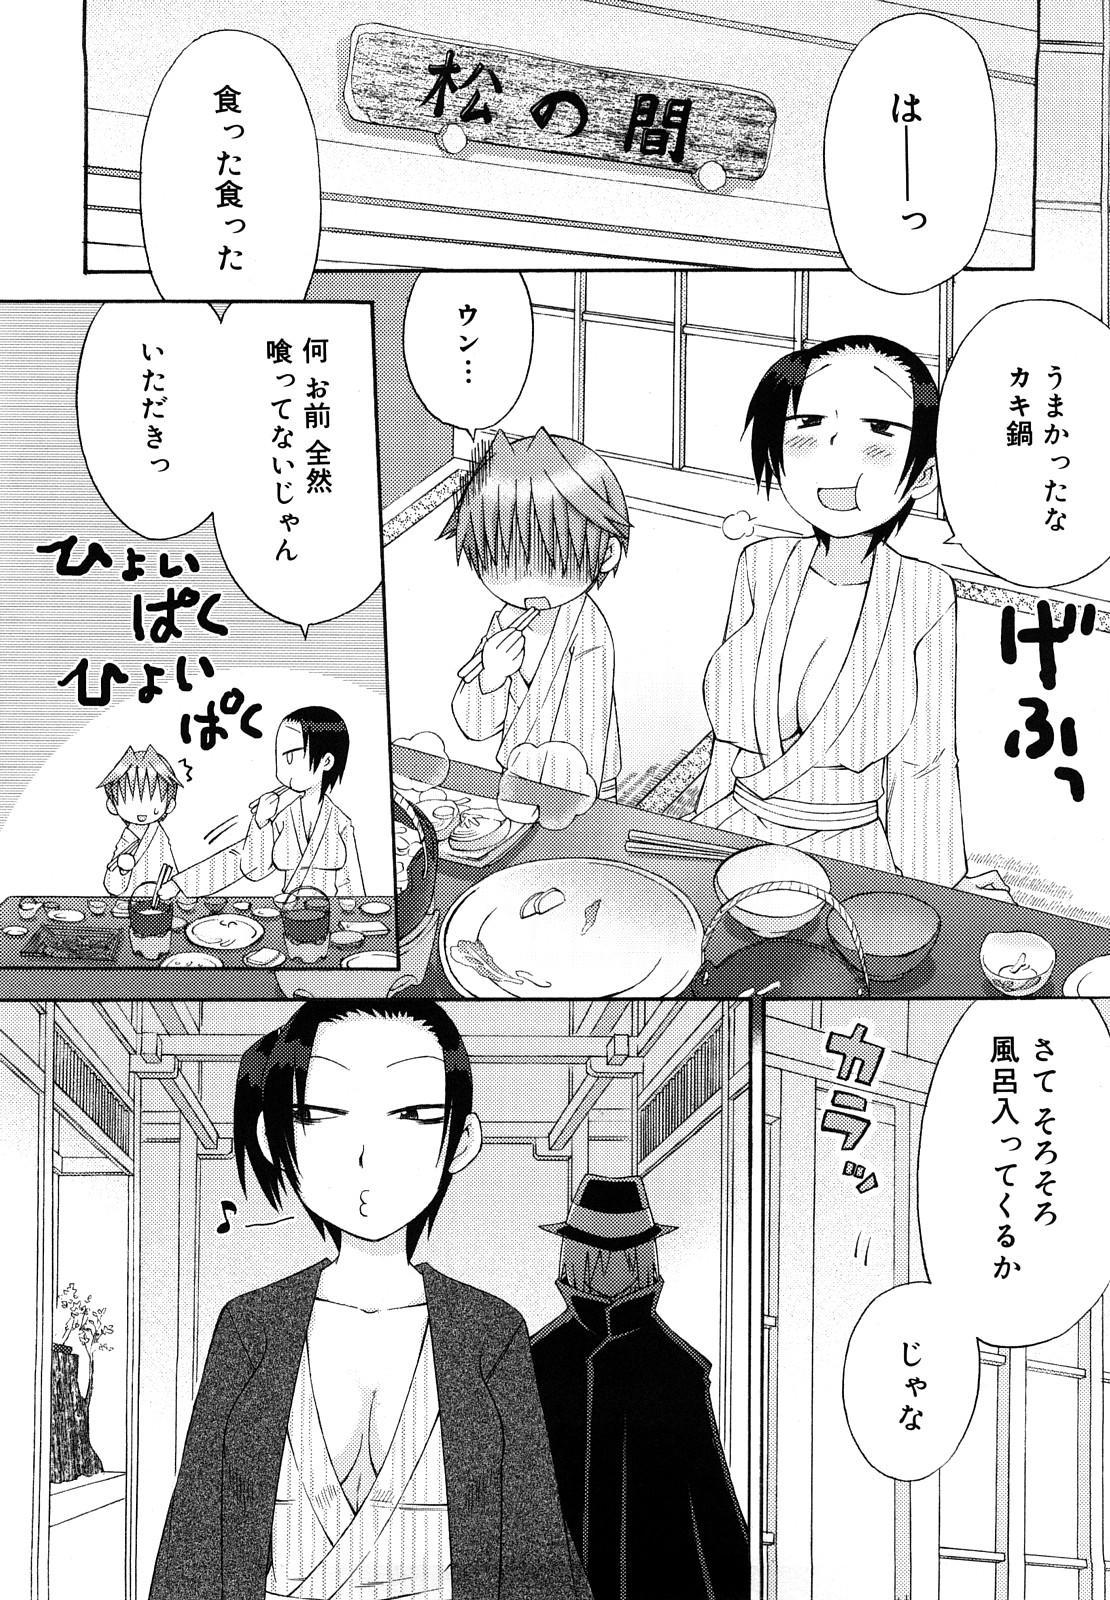 Hatsuden Pandakun! Shinsouban 132